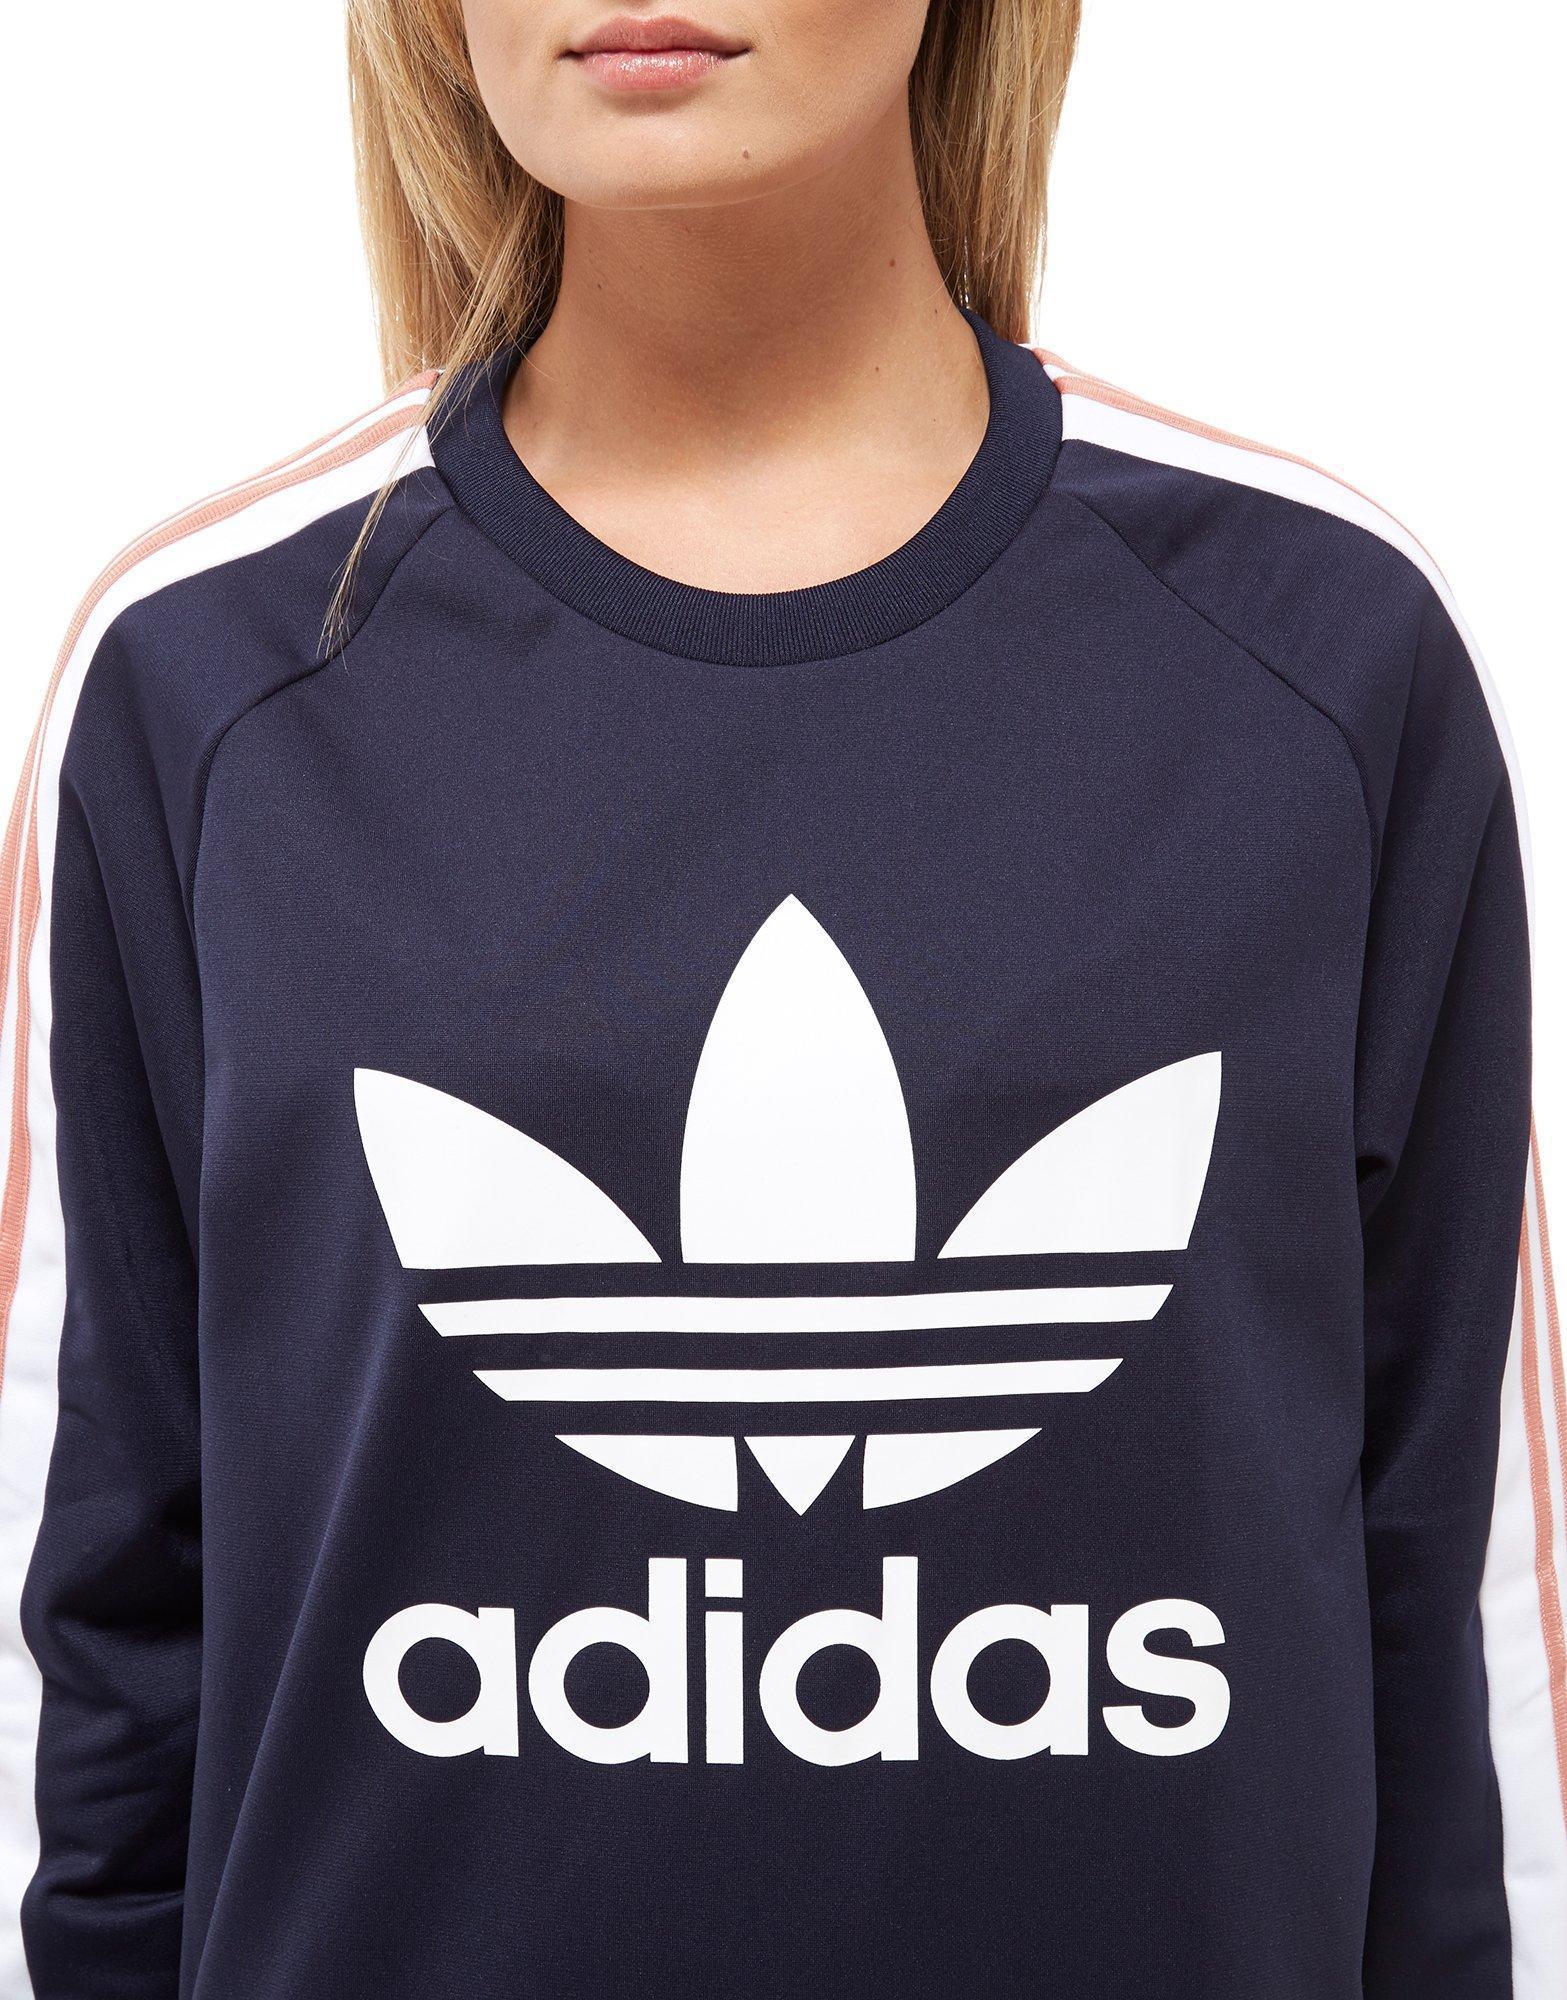 Lyst adidas Originals 3 Stripes grupo Crew sudadera en azul